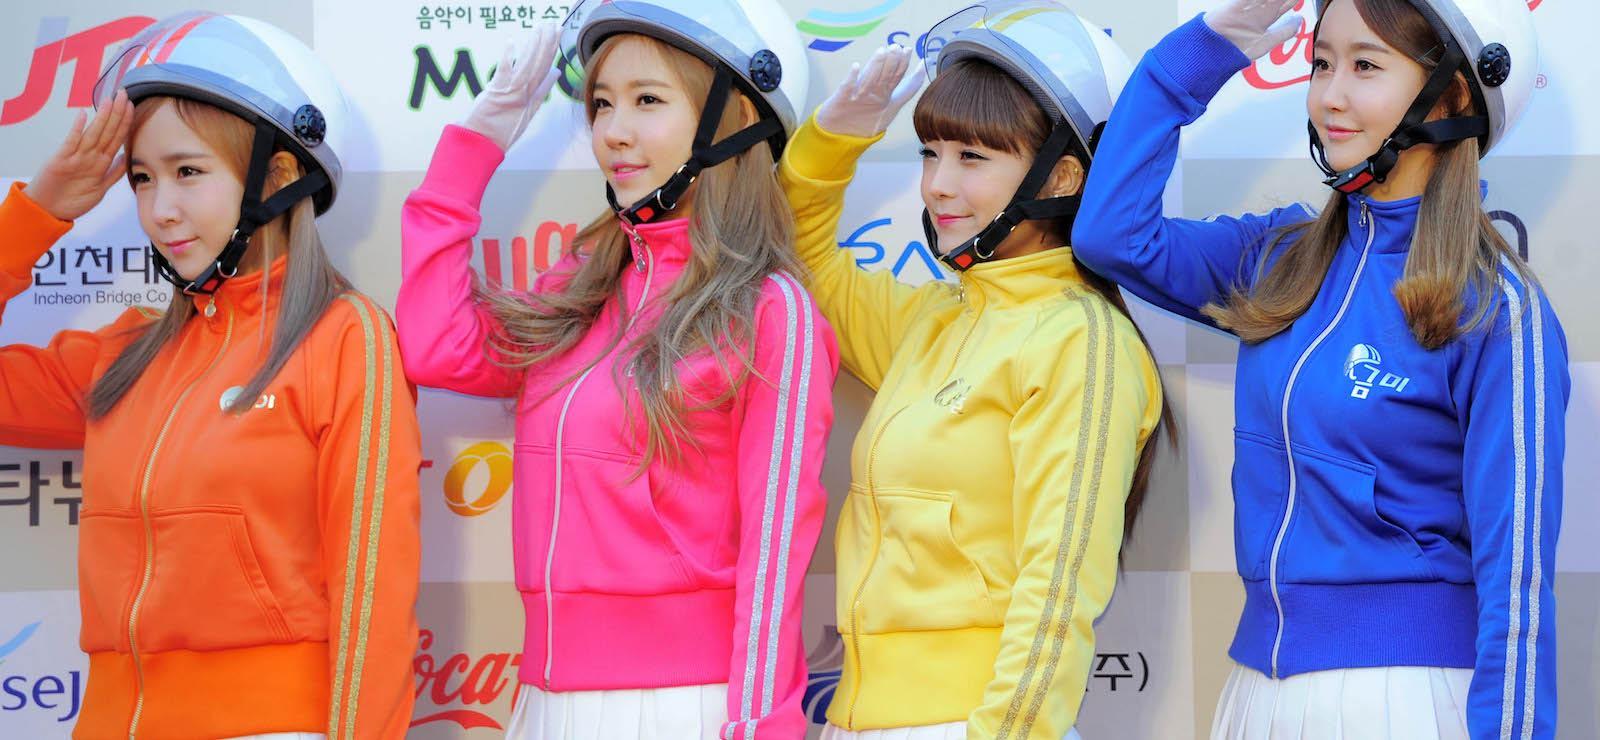 Idols in South Korea and Japan | The Interpreter